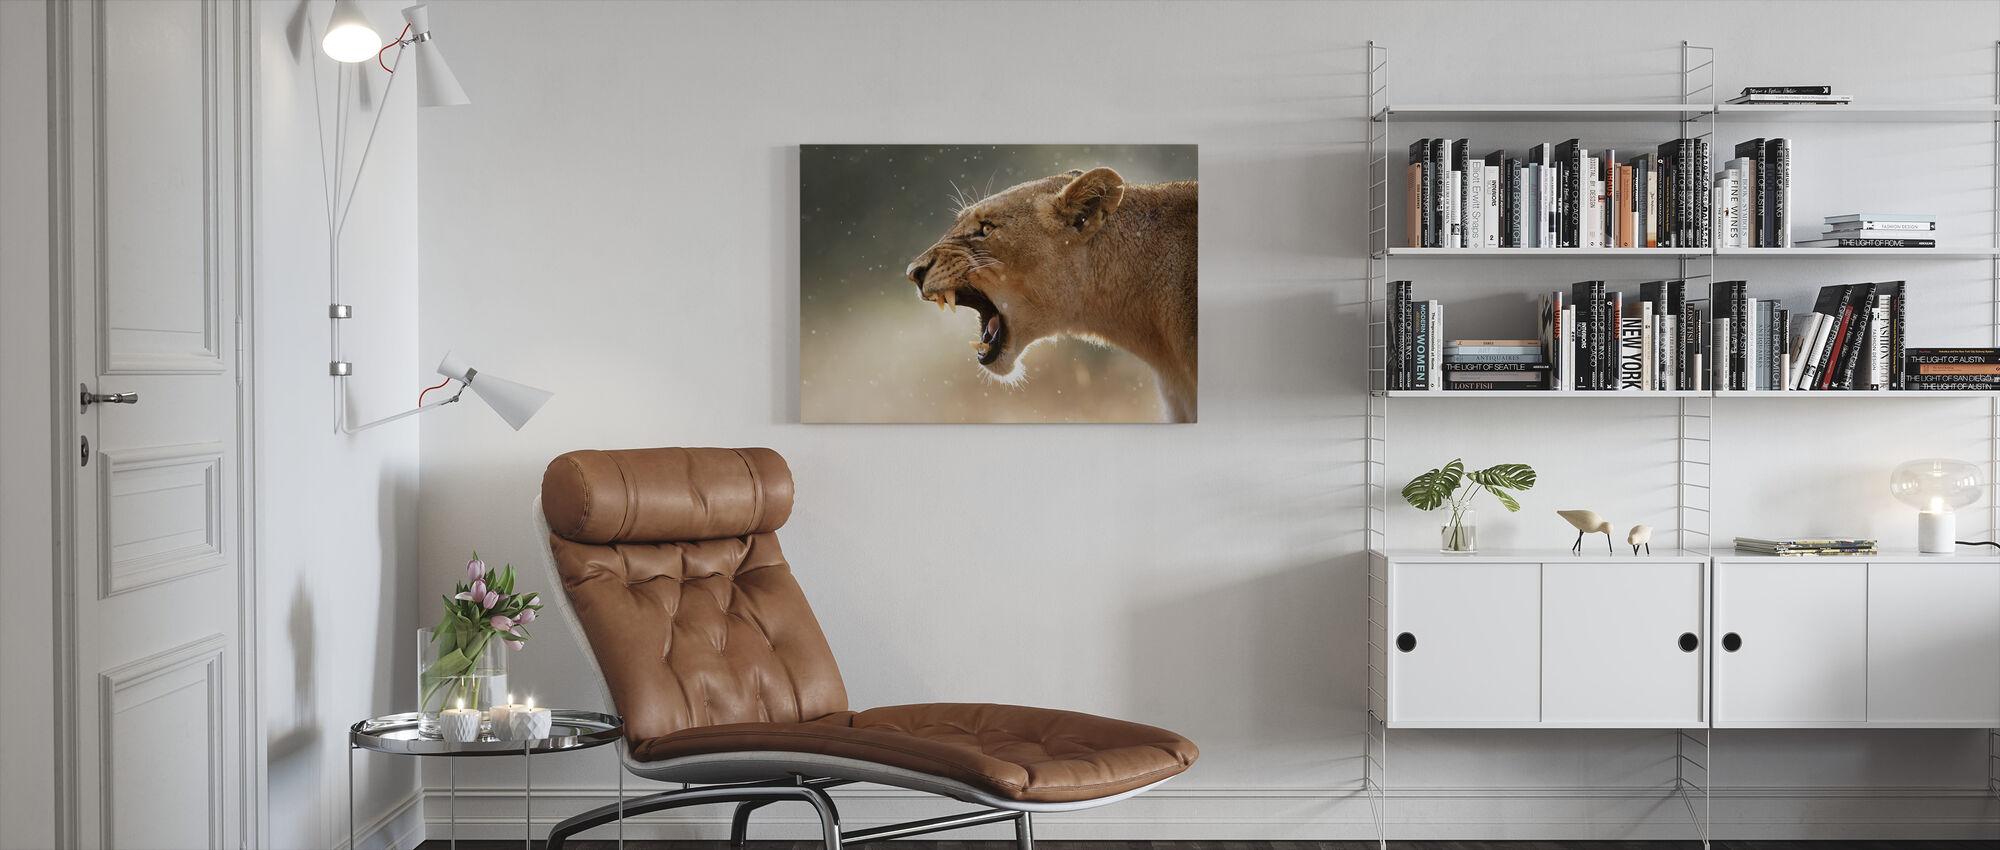 The Lions Roar - Canvas print - Living Room